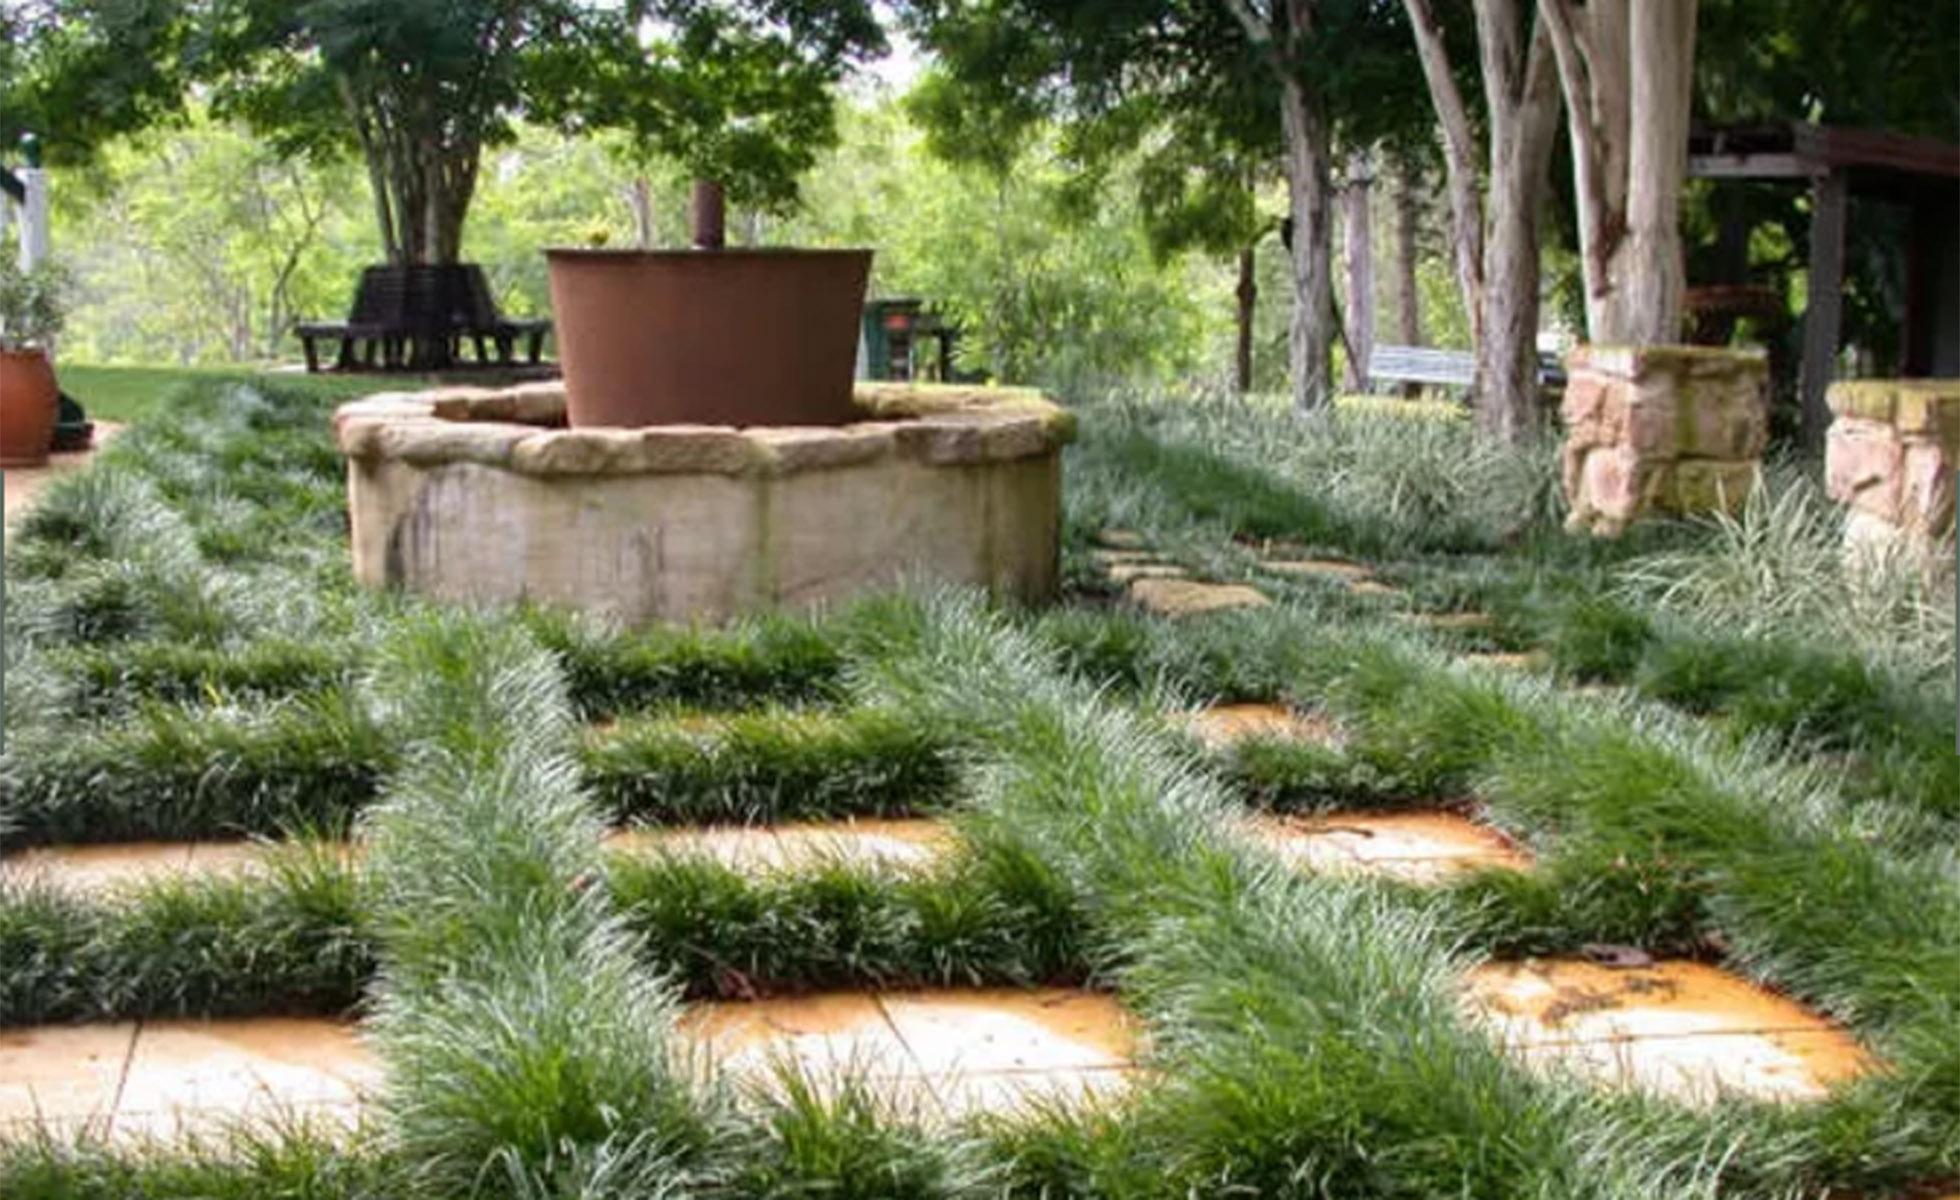 Steven-Clegg-Design-pots-planters